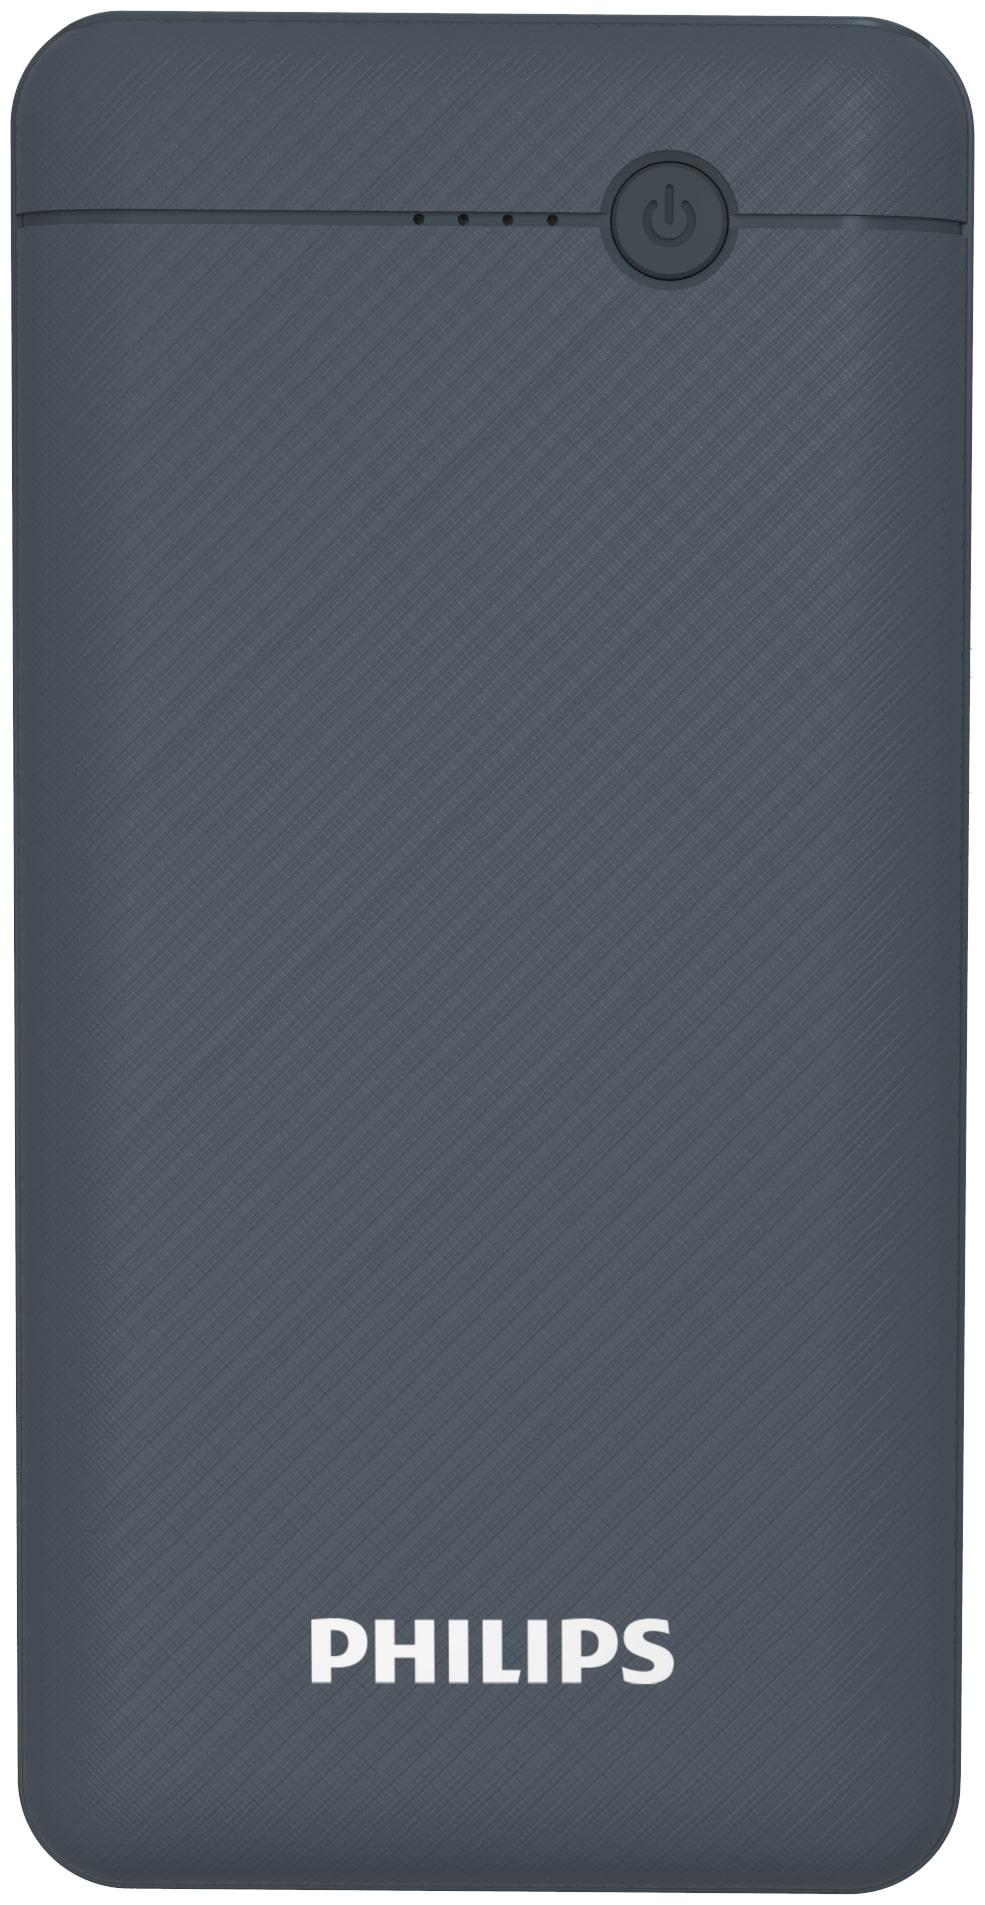 Philips DLP1710CV 10000 mAh Li-Polymer Portable Power Bank Black